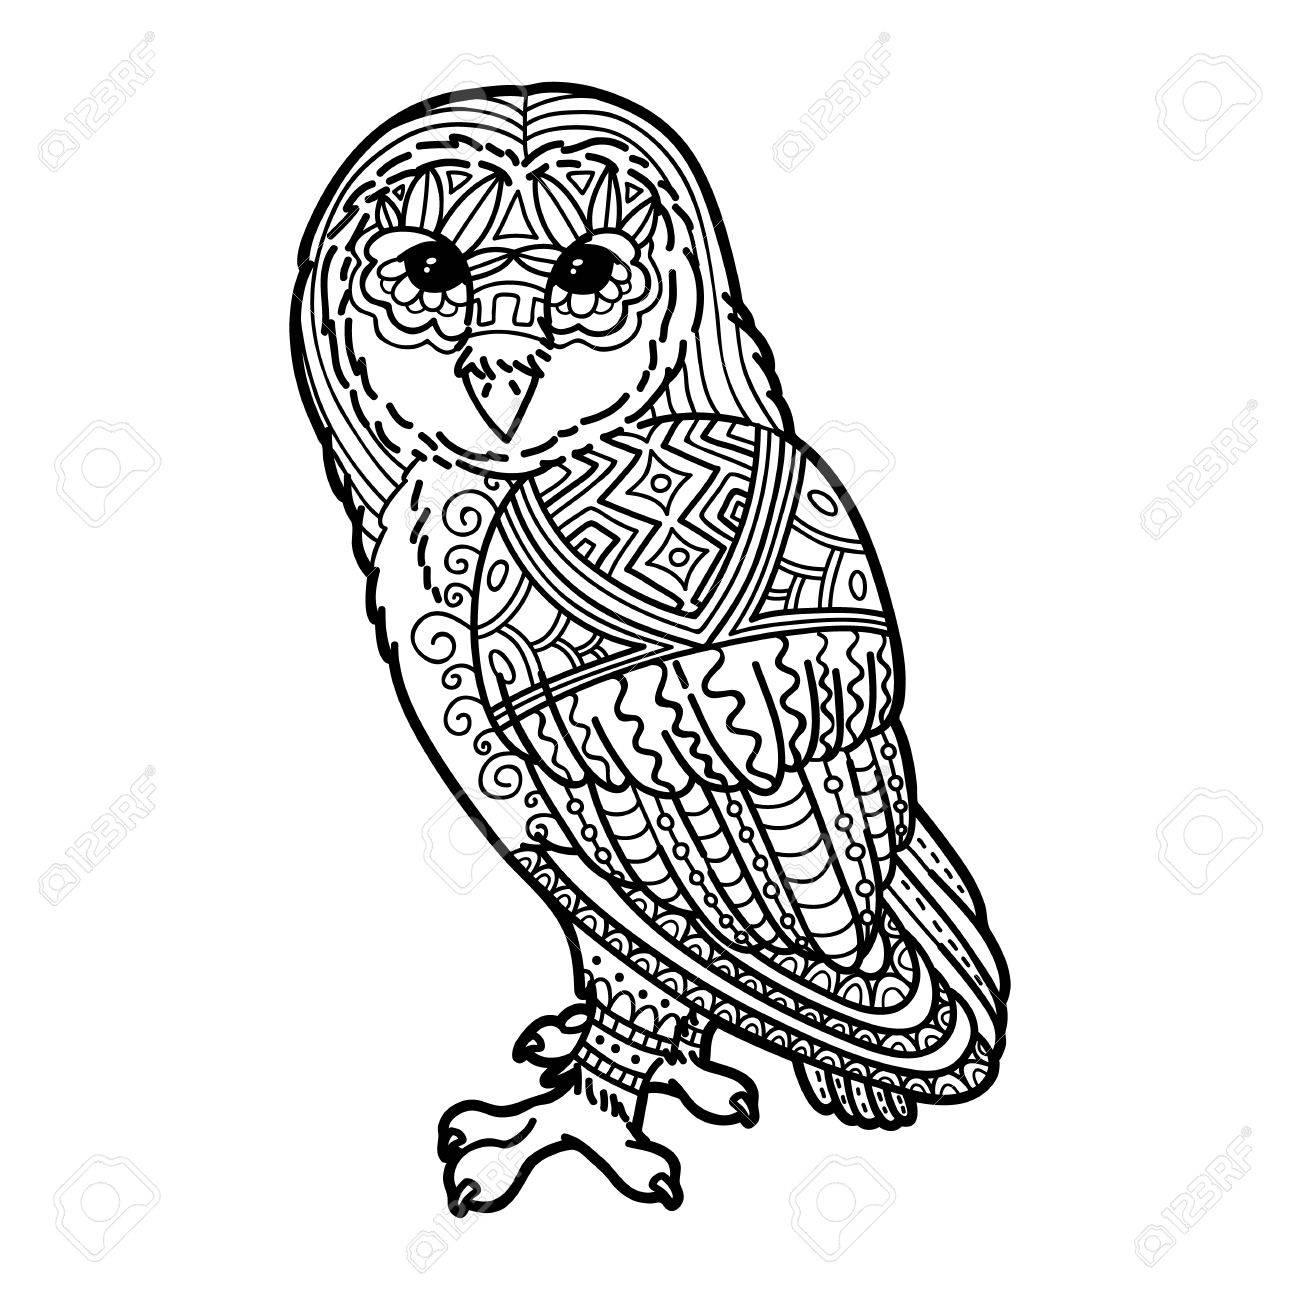 1300x1300 371 Barn Owl Stock Vector Illustration And Royalty Free Barn Owl